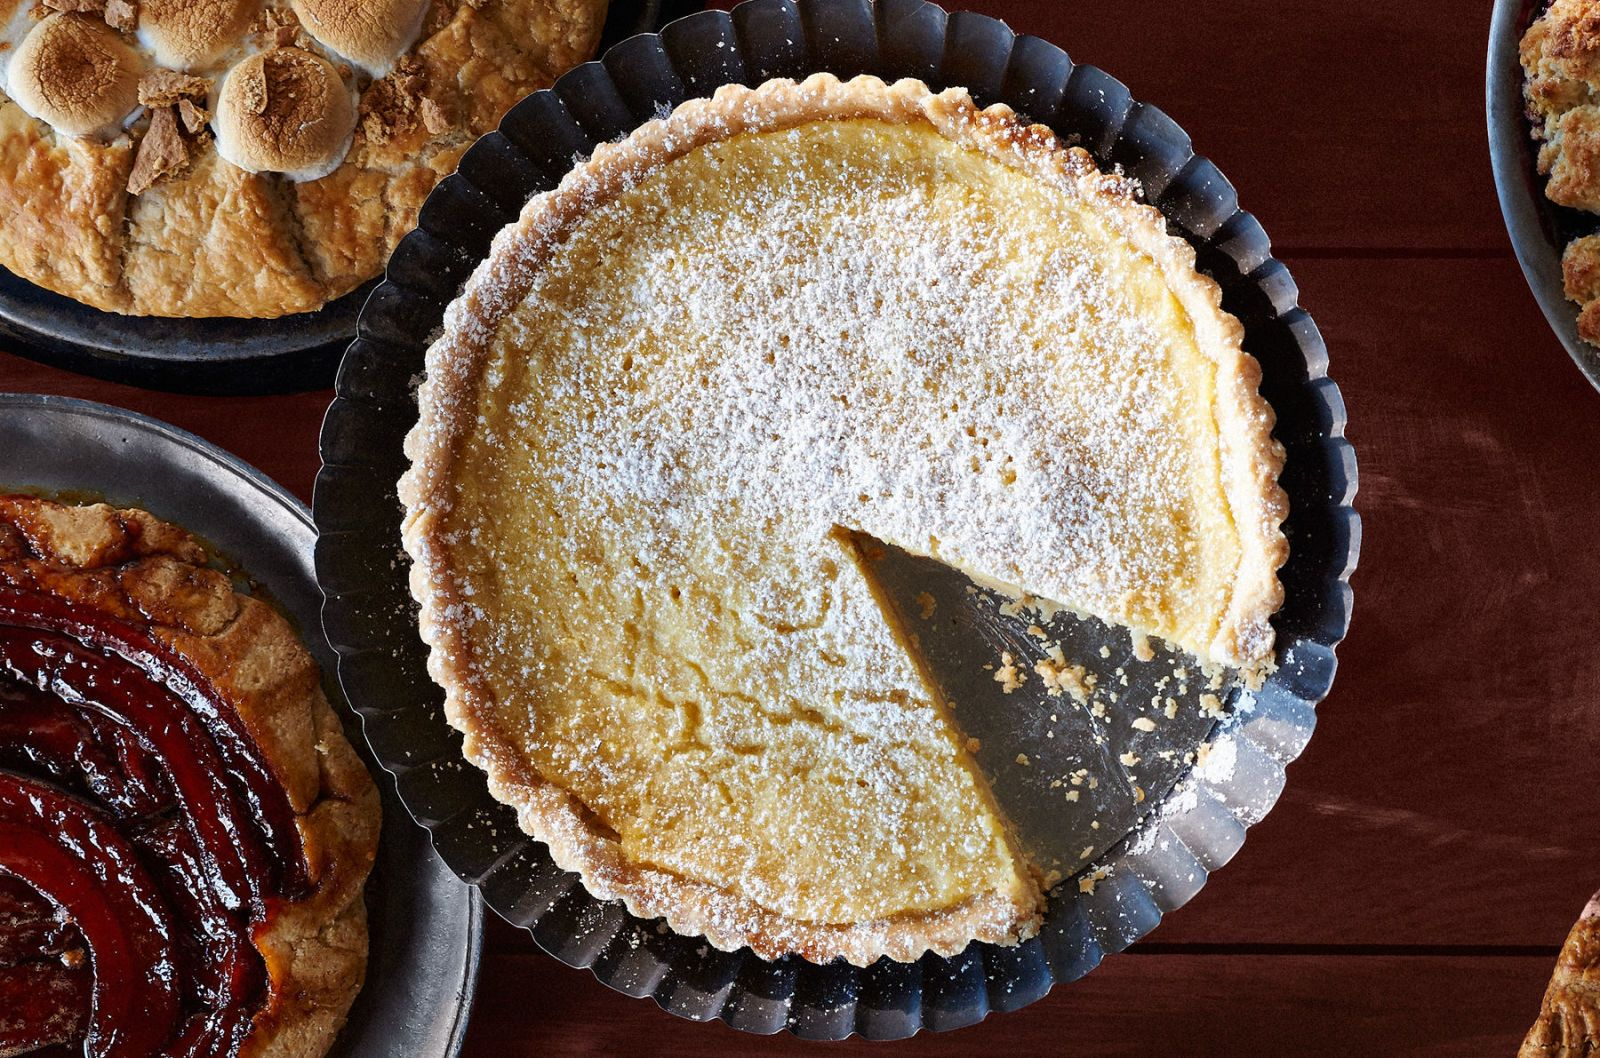 Lemon Buttermilk Tart Recipe Thanksgiving Pie Recipes Buttermilk Tart Lemon Recipes